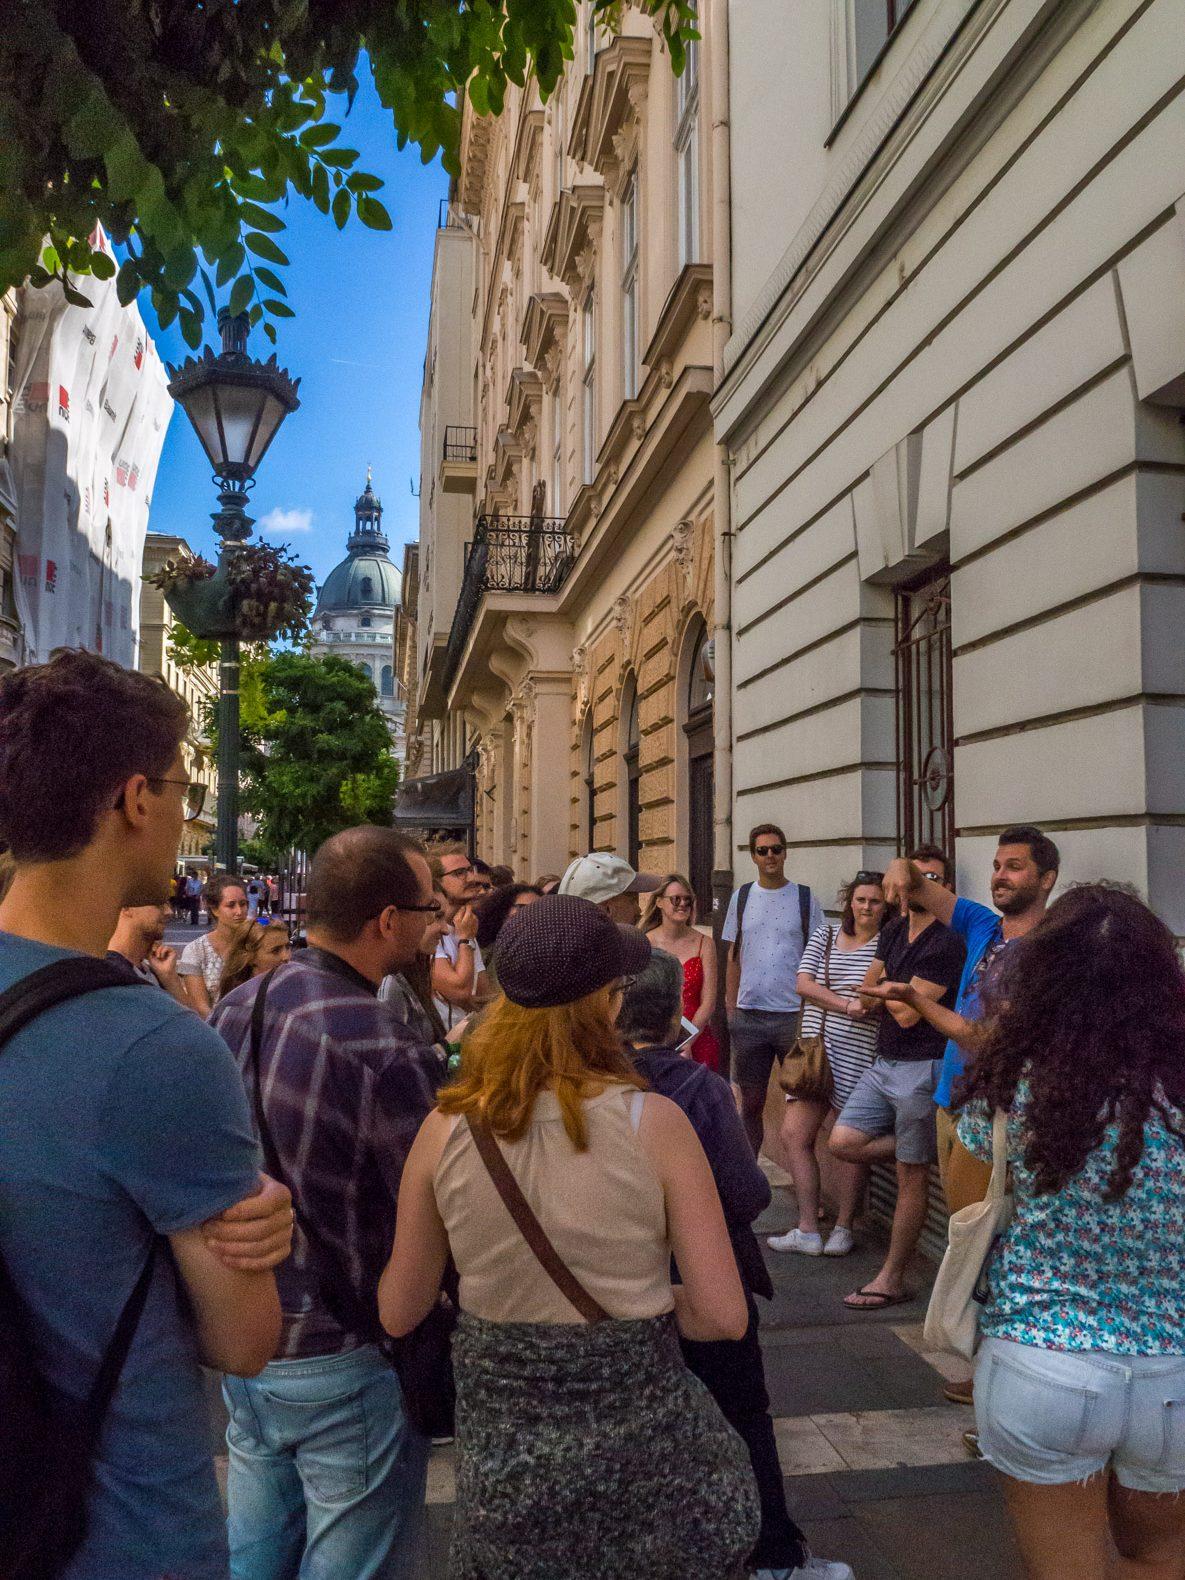 Budapest things to do: take a free walking tour